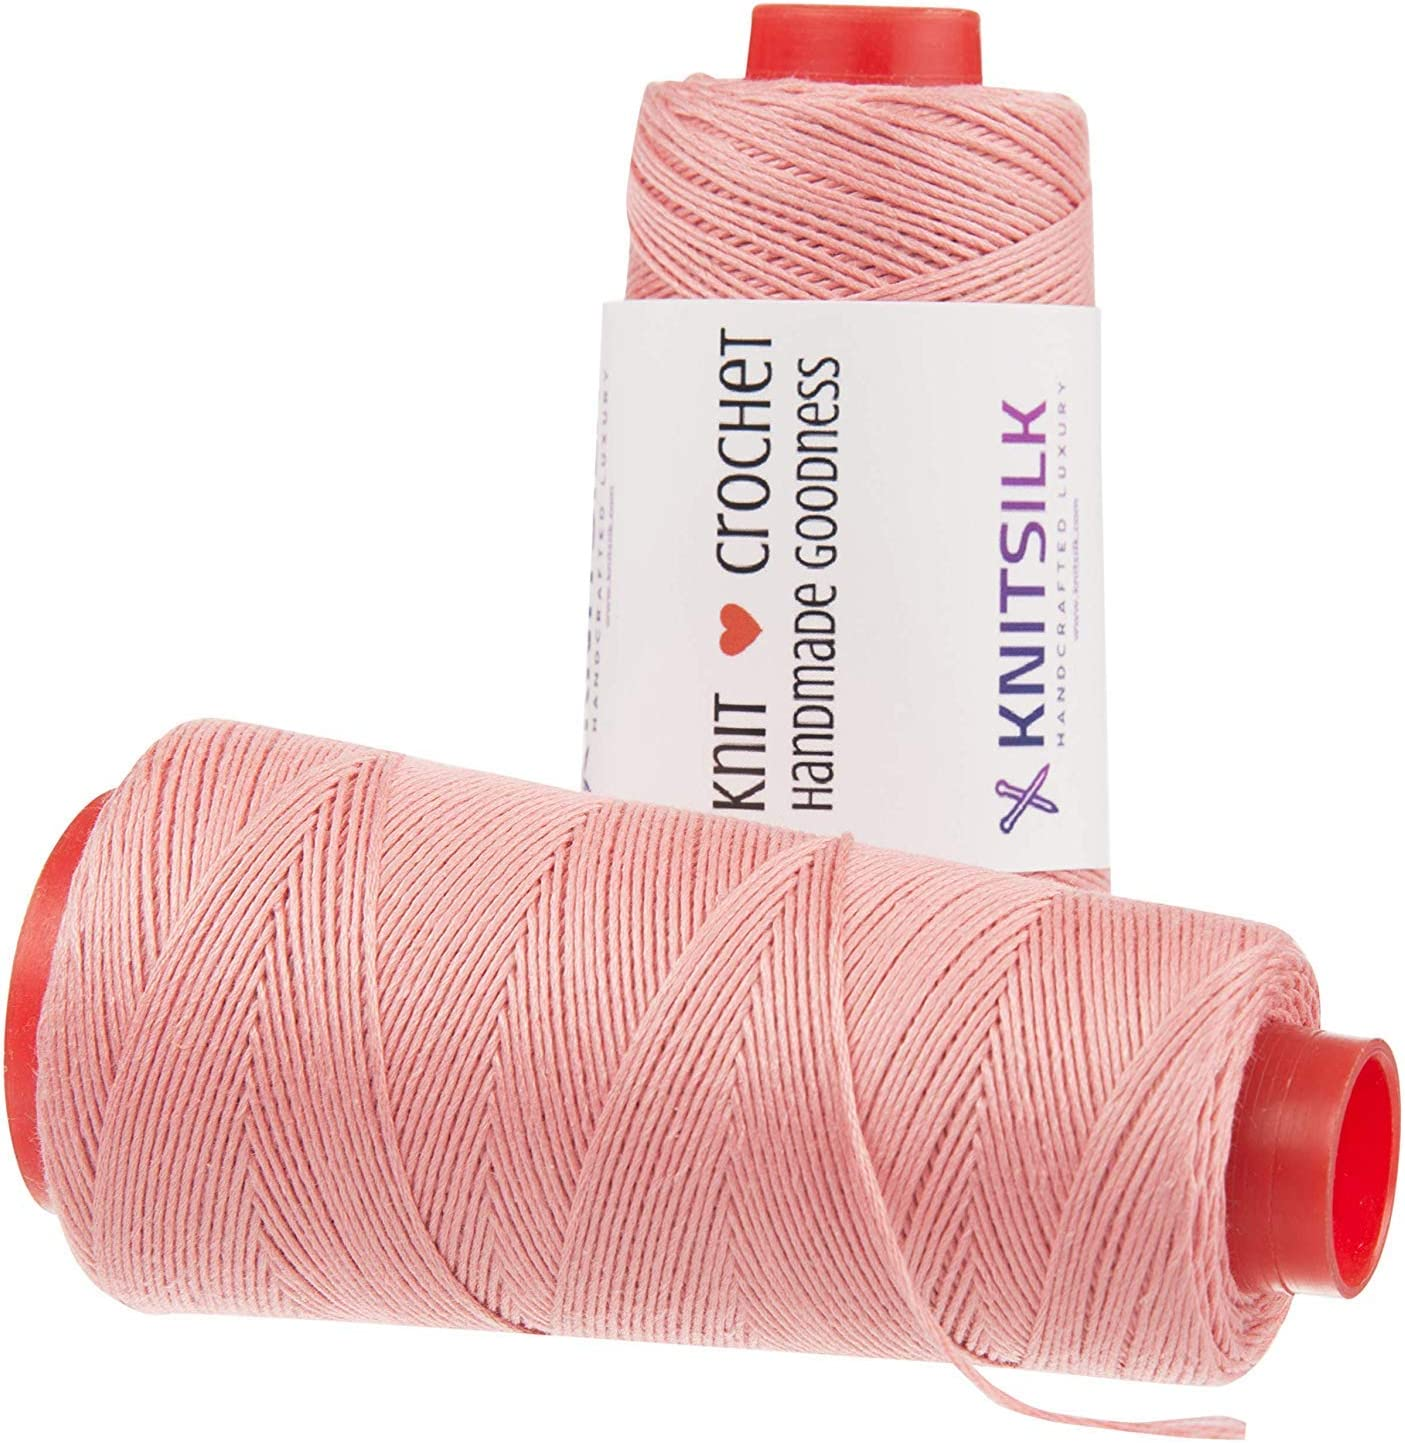 KnitSilk Pure Silk Viscose Blend Yarn in Cones - Knit, Crochet, Weave, Tatting, Jewelry, Crafts (8 Ply - 160 Yards, Pack of 1) (Blush Pink)